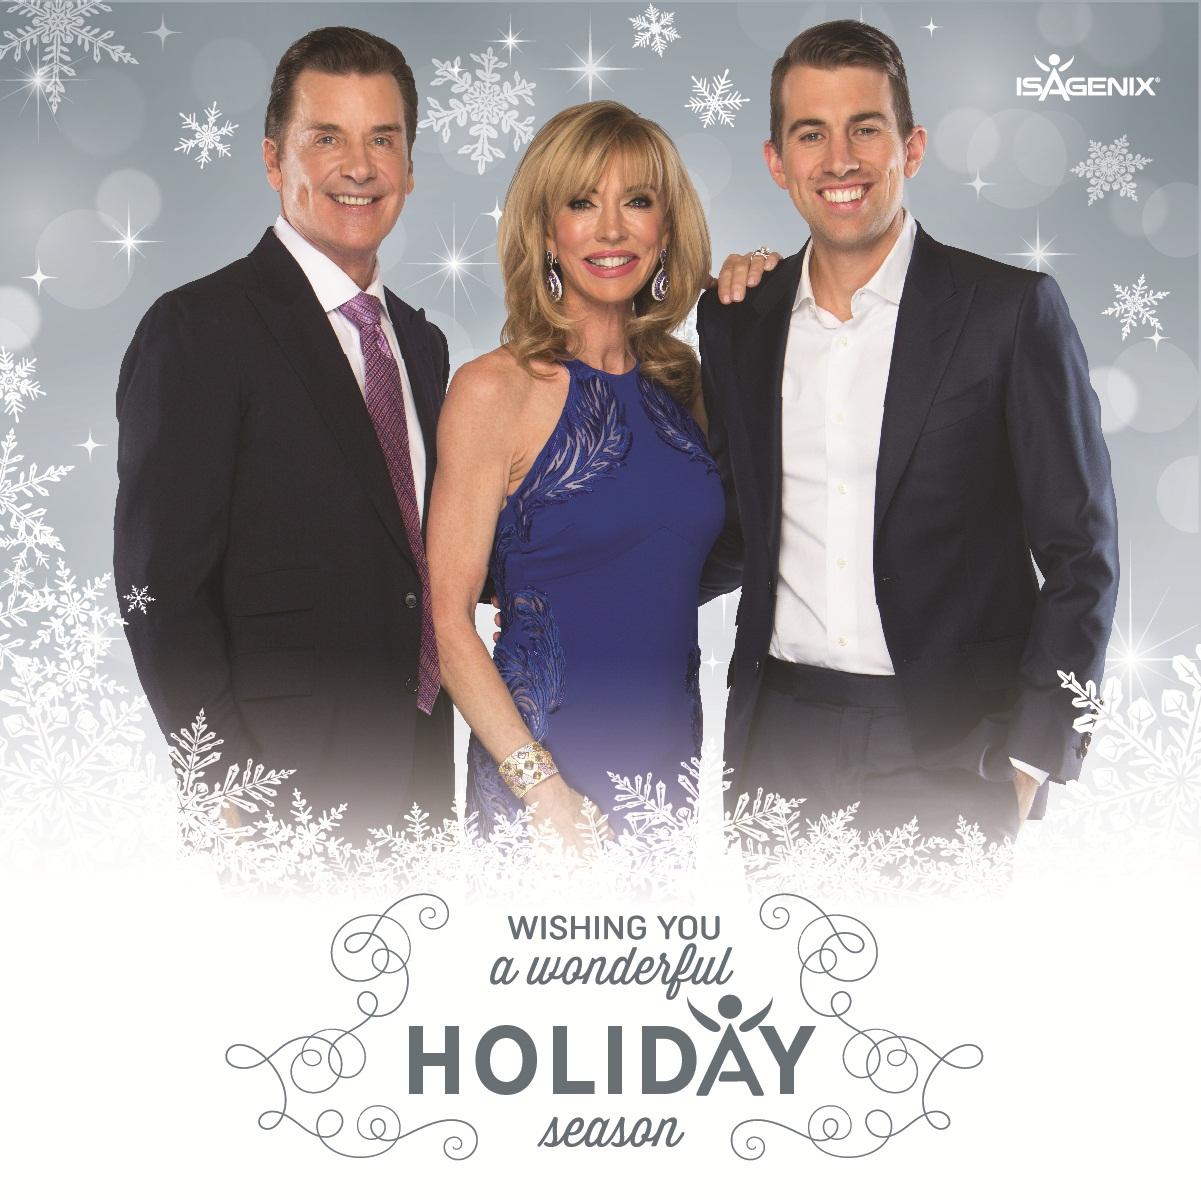 12-22-16-happy-holidays-christine-2-1200x1200